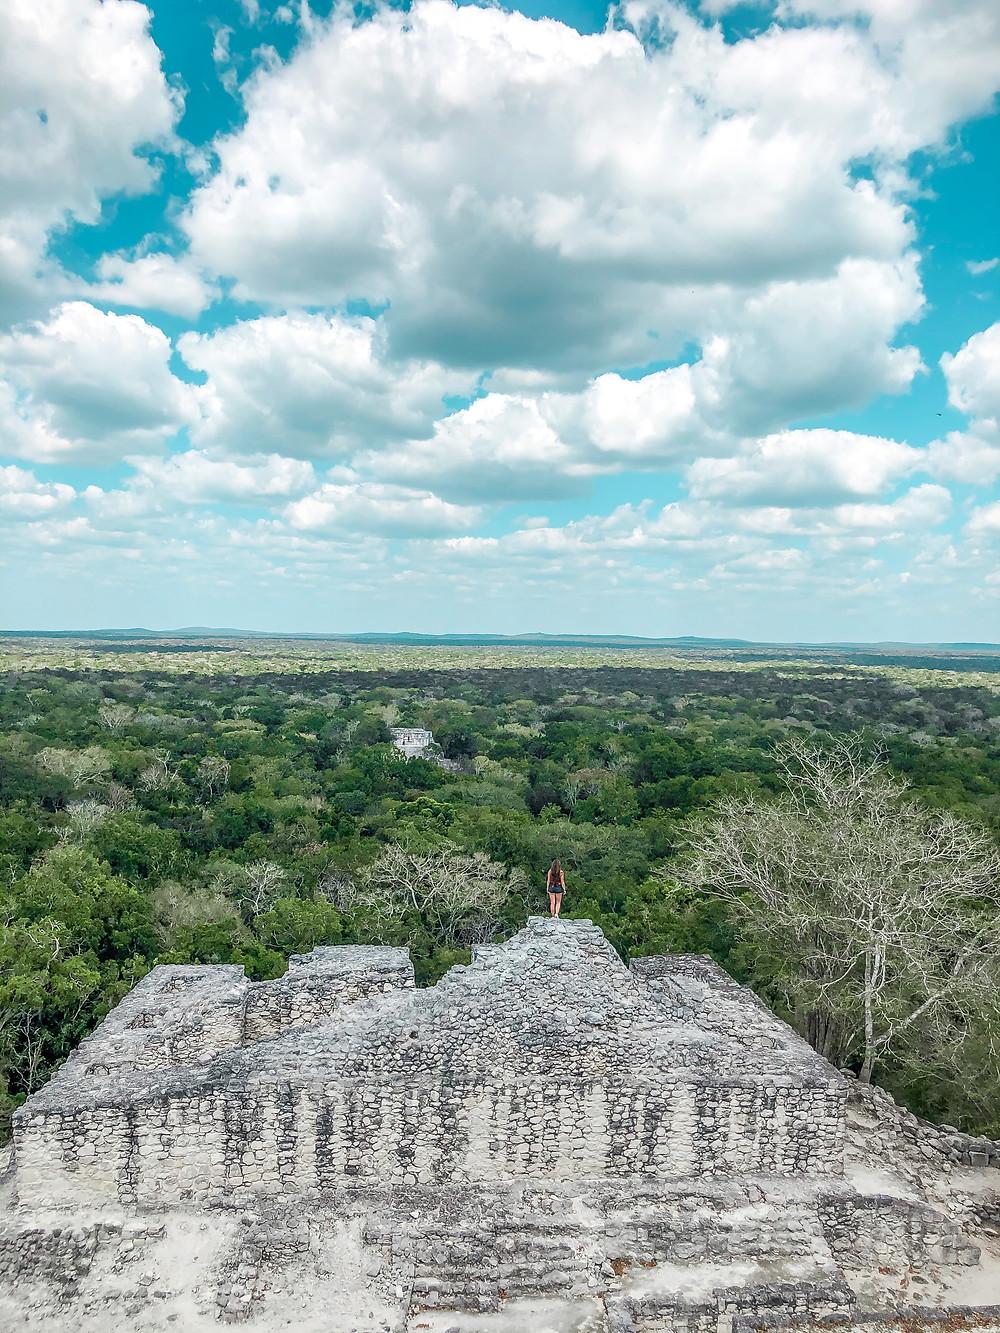 Mexiko-Tempel-Maya-Calakmul-ruinen-dschungel-eigene-Faust